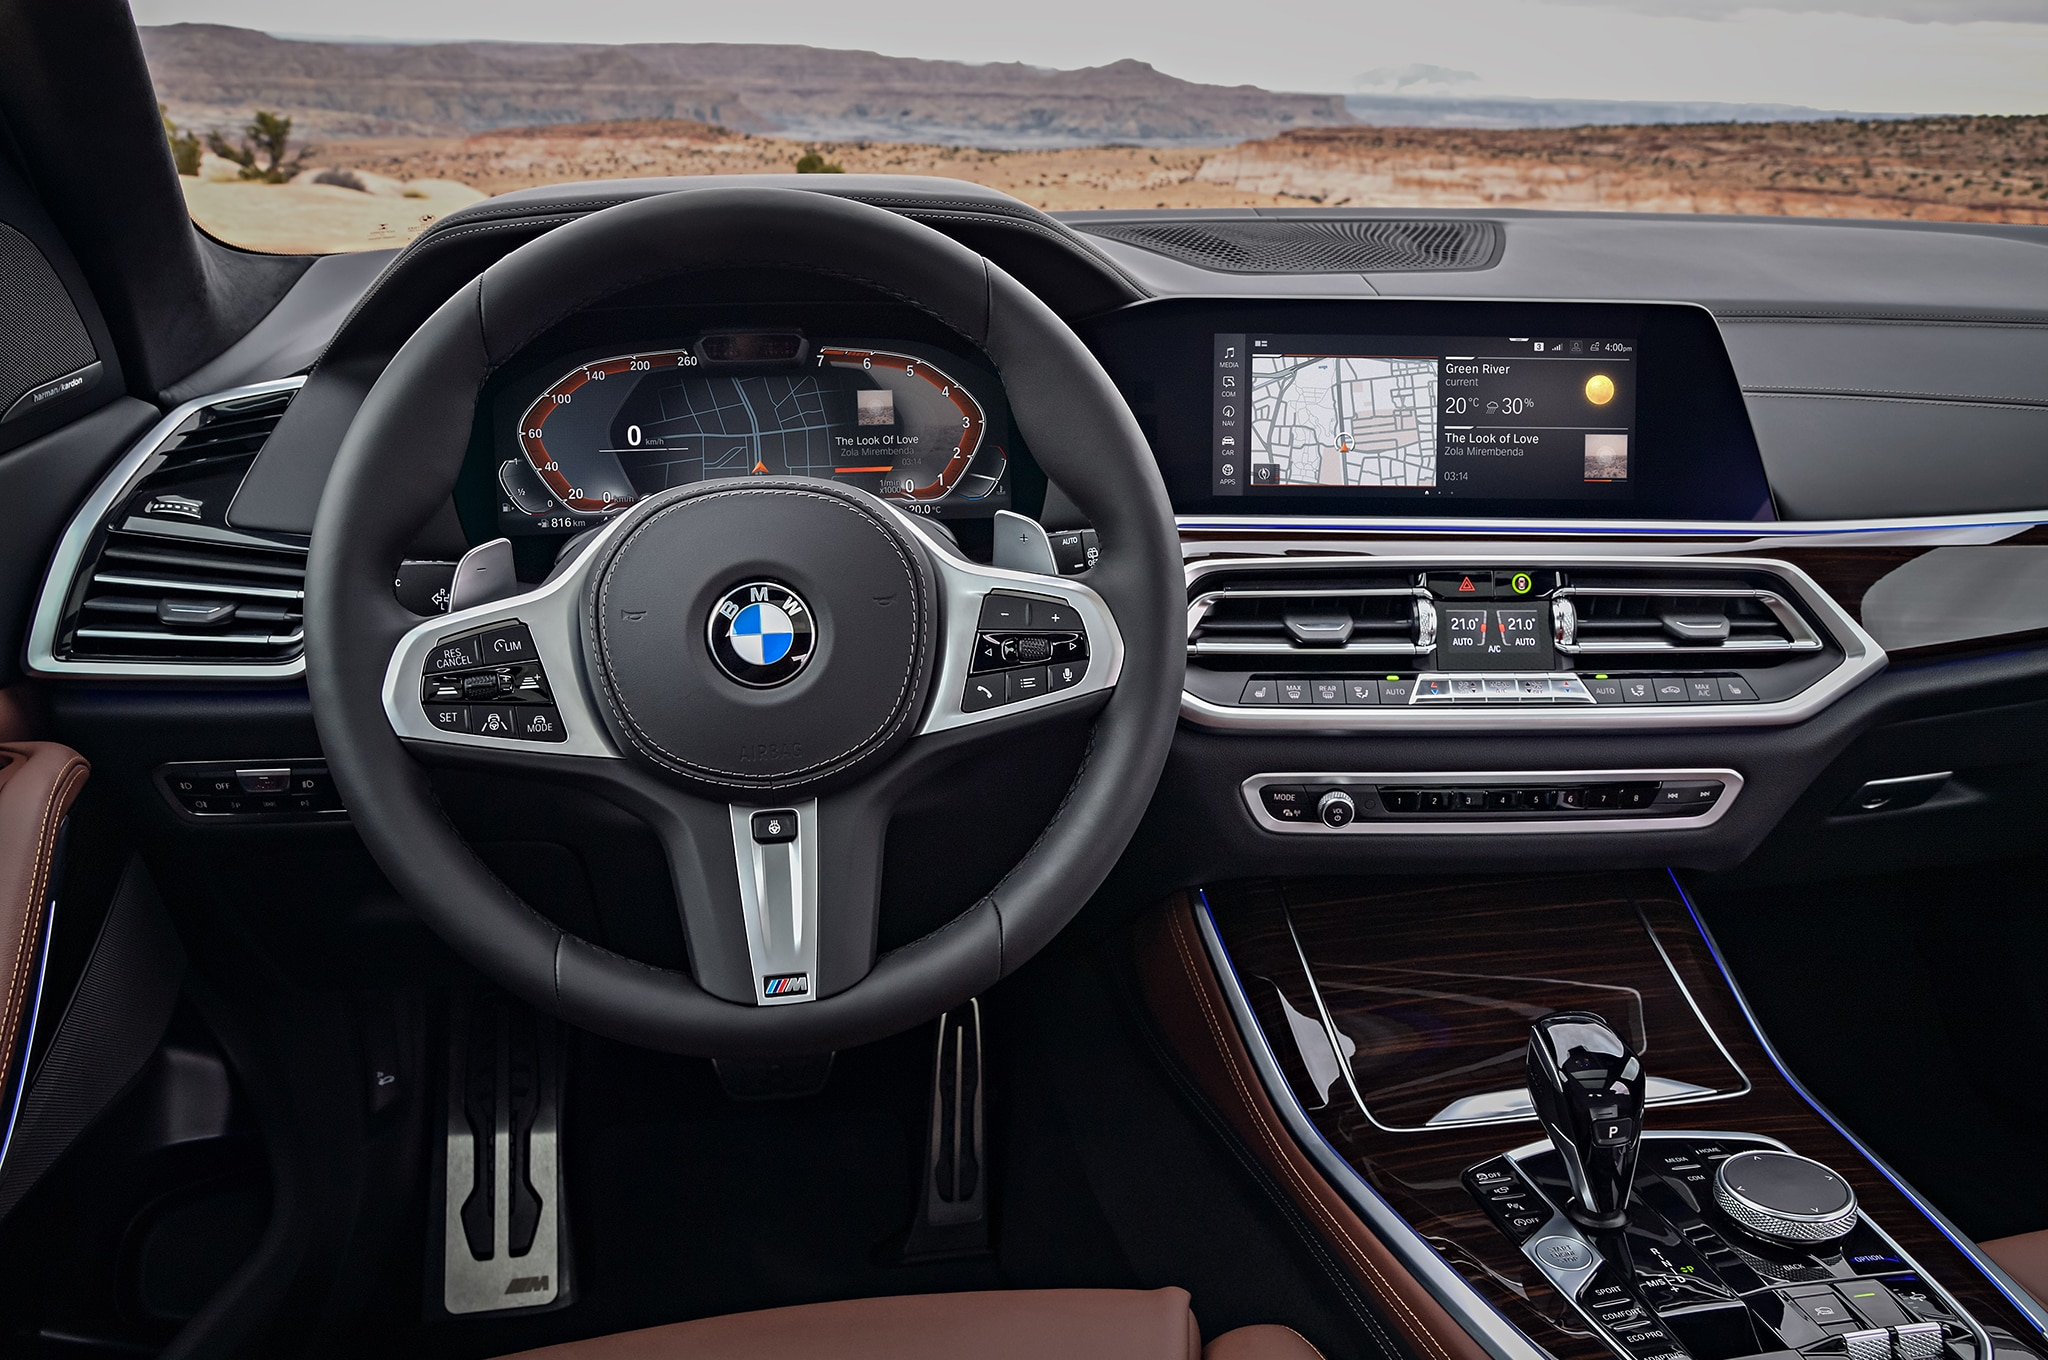 2019 Bmw X5 Front Interior Drivers Side Motor Trend En Espa 241 Ol